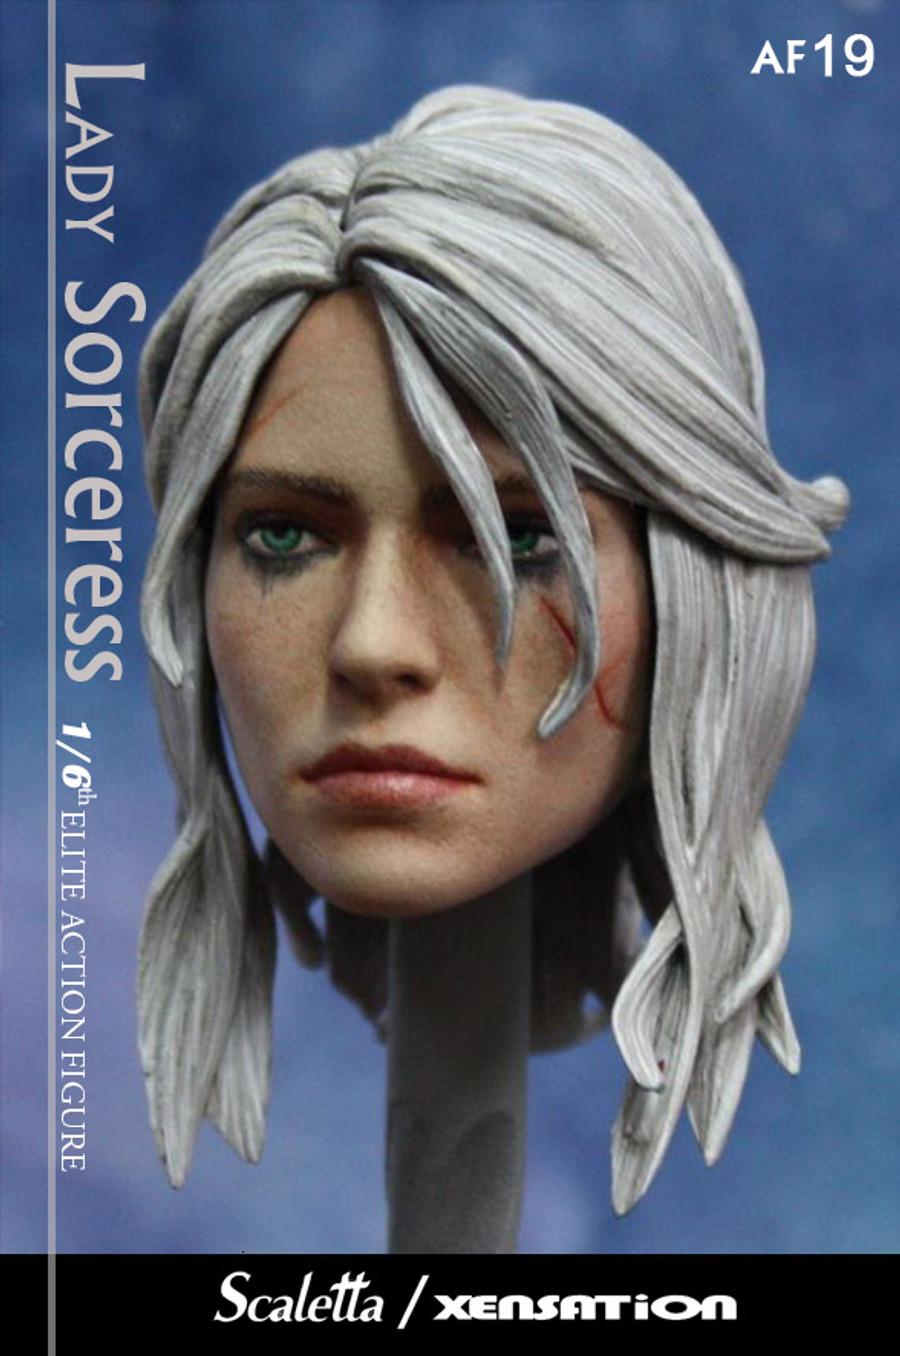 Xensation x Scaletta - The Lady Sorceress